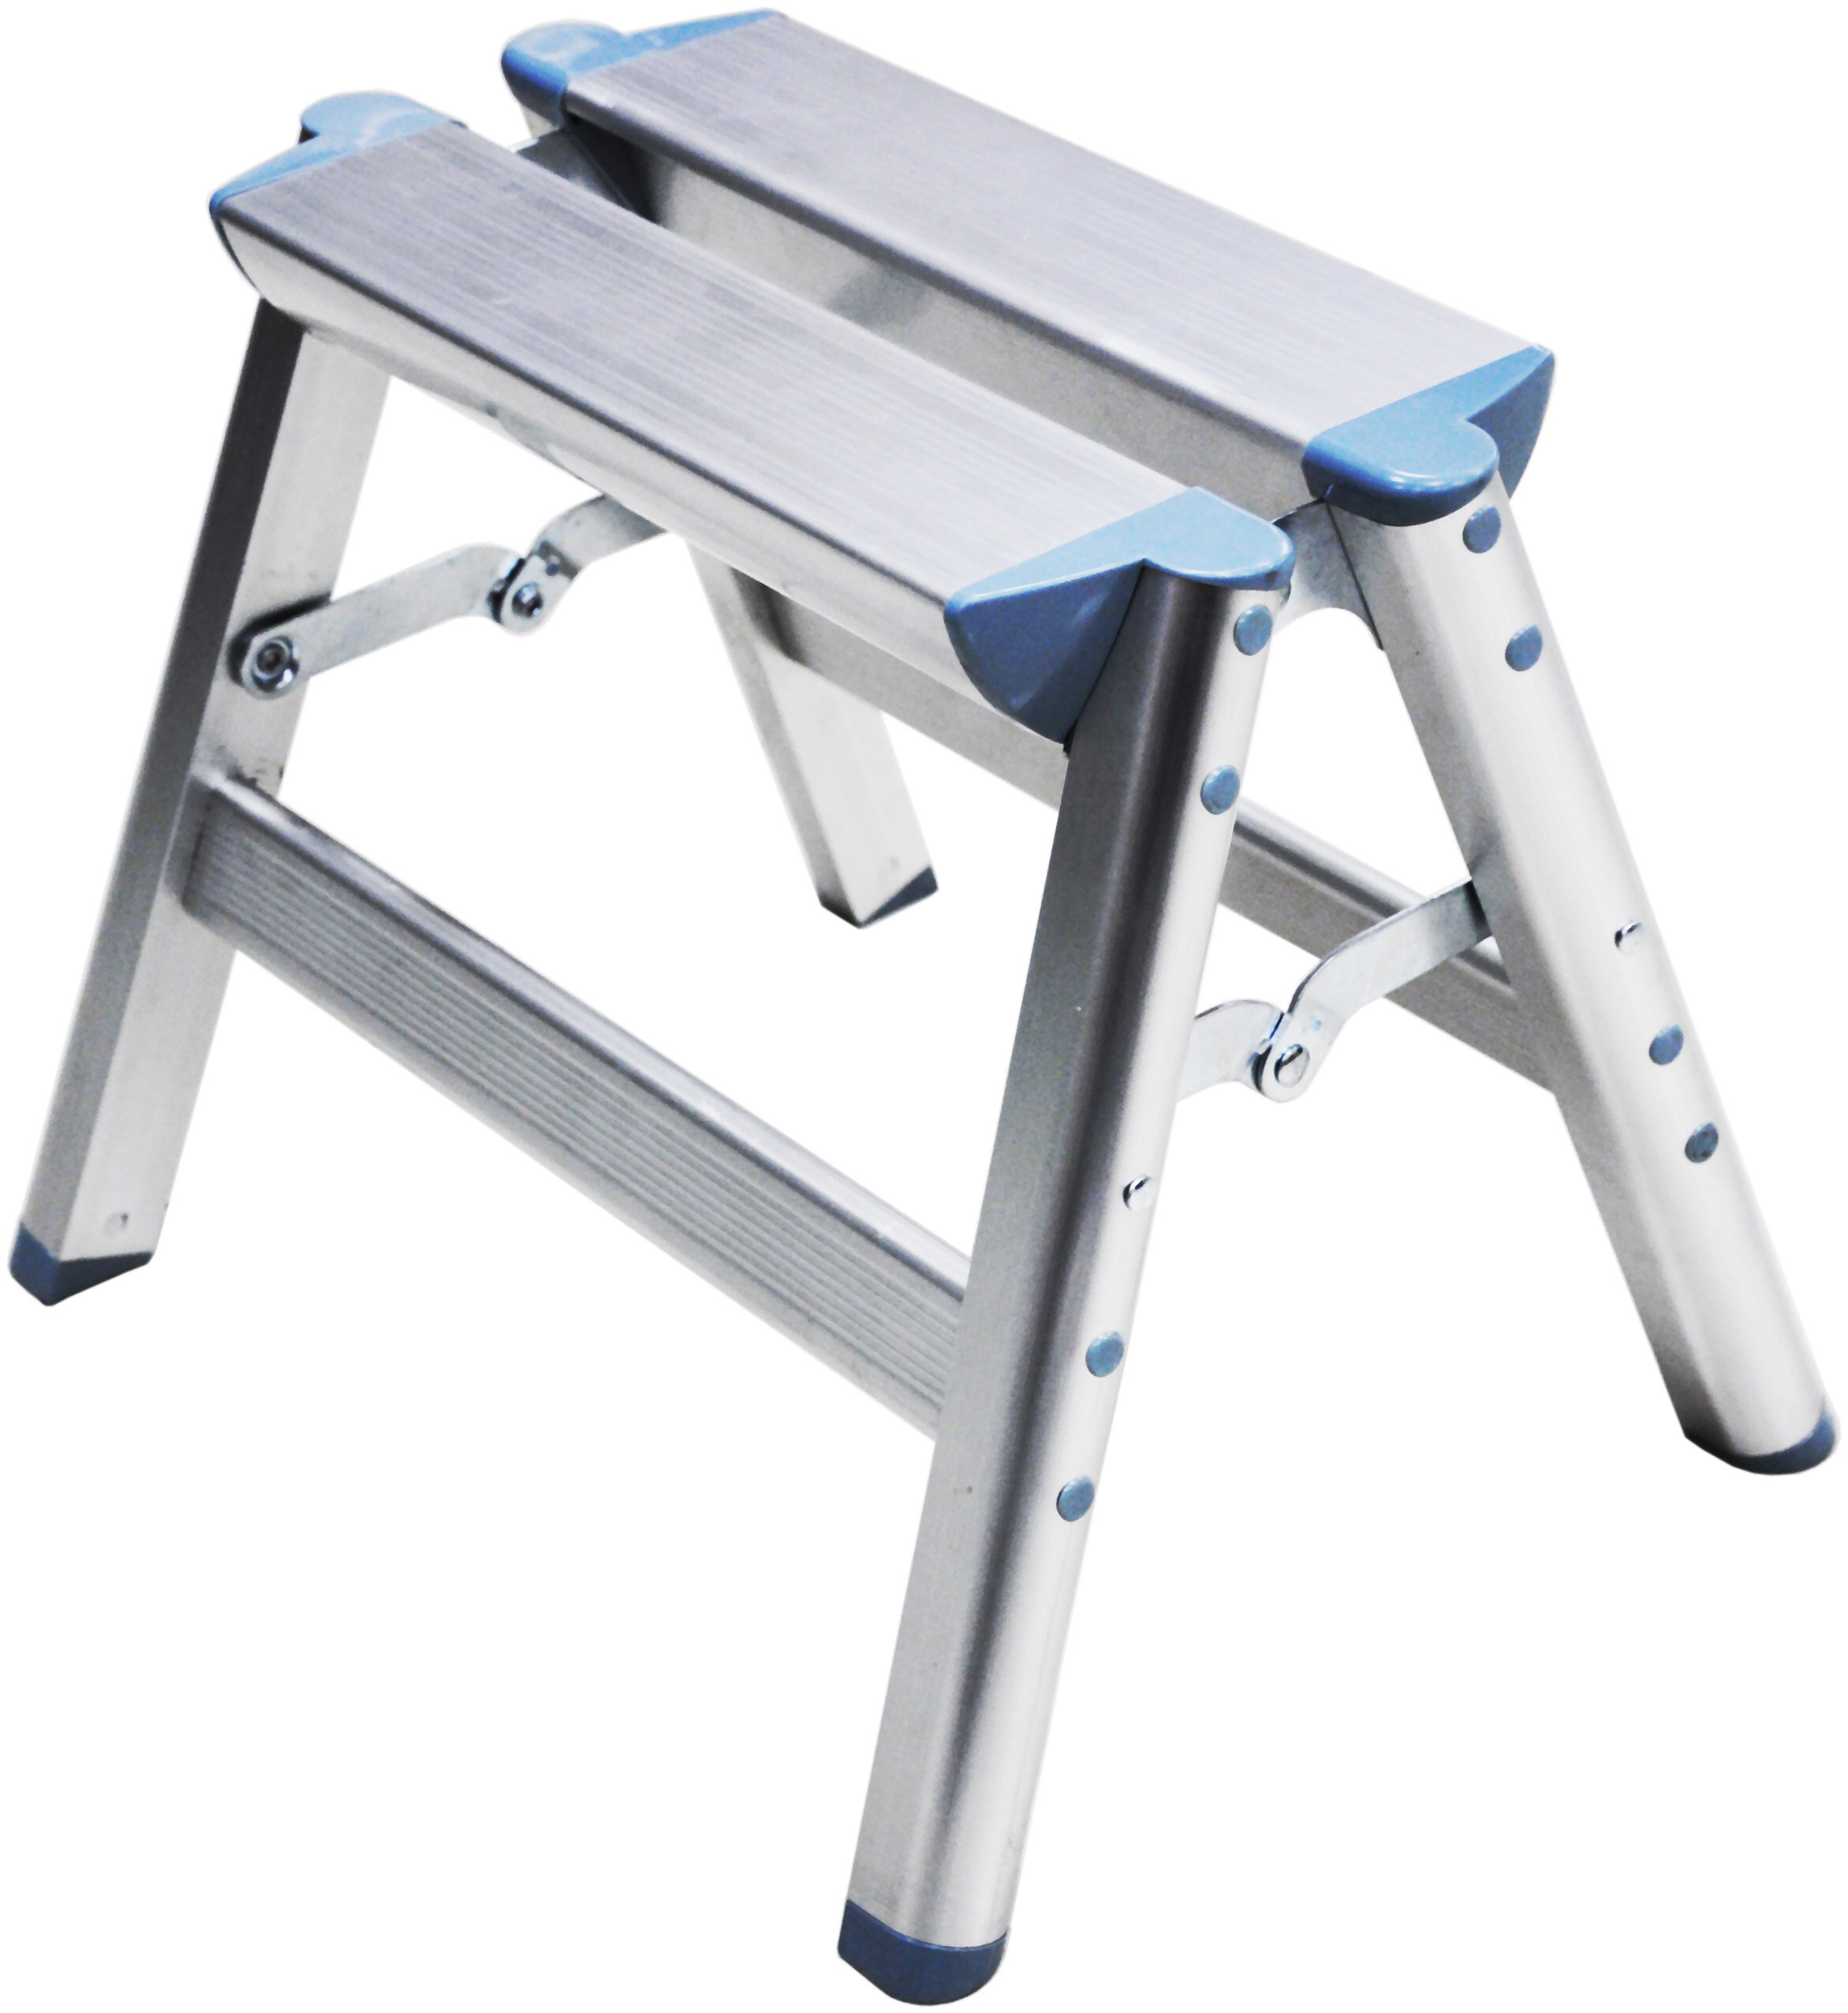 Magnificent 1 Step Aluminum Step Stool With 300 Lb Load Capacity Creativecarmelina Interior Chair Design Creativecarmelinacom